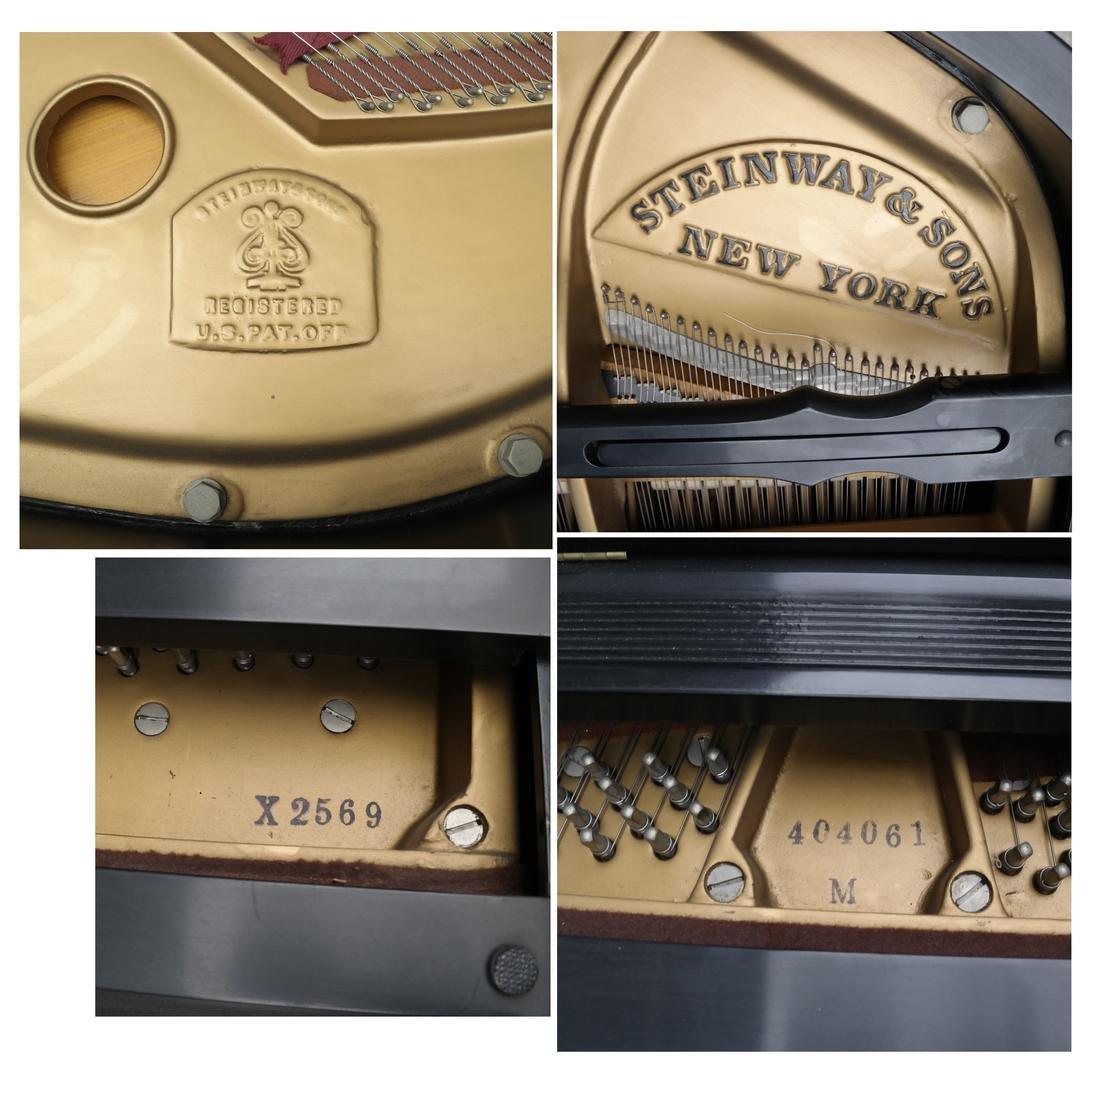 Steinway & Sons Studio Grand Piano, Model 404061 M - 3